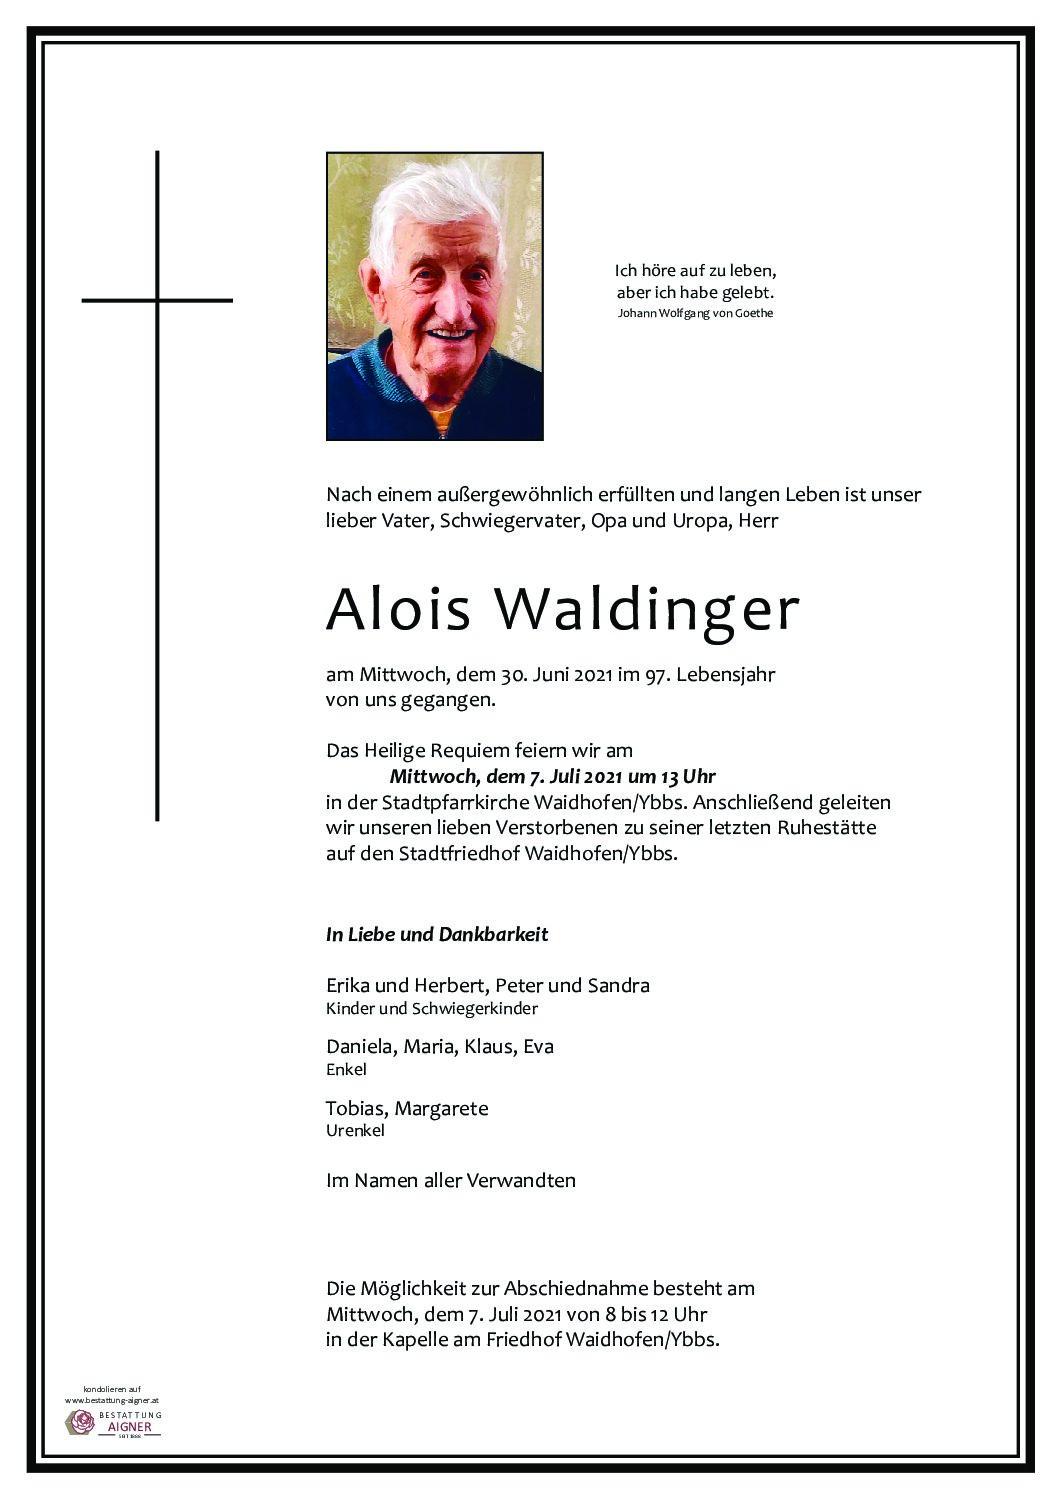 Alois Waldinger